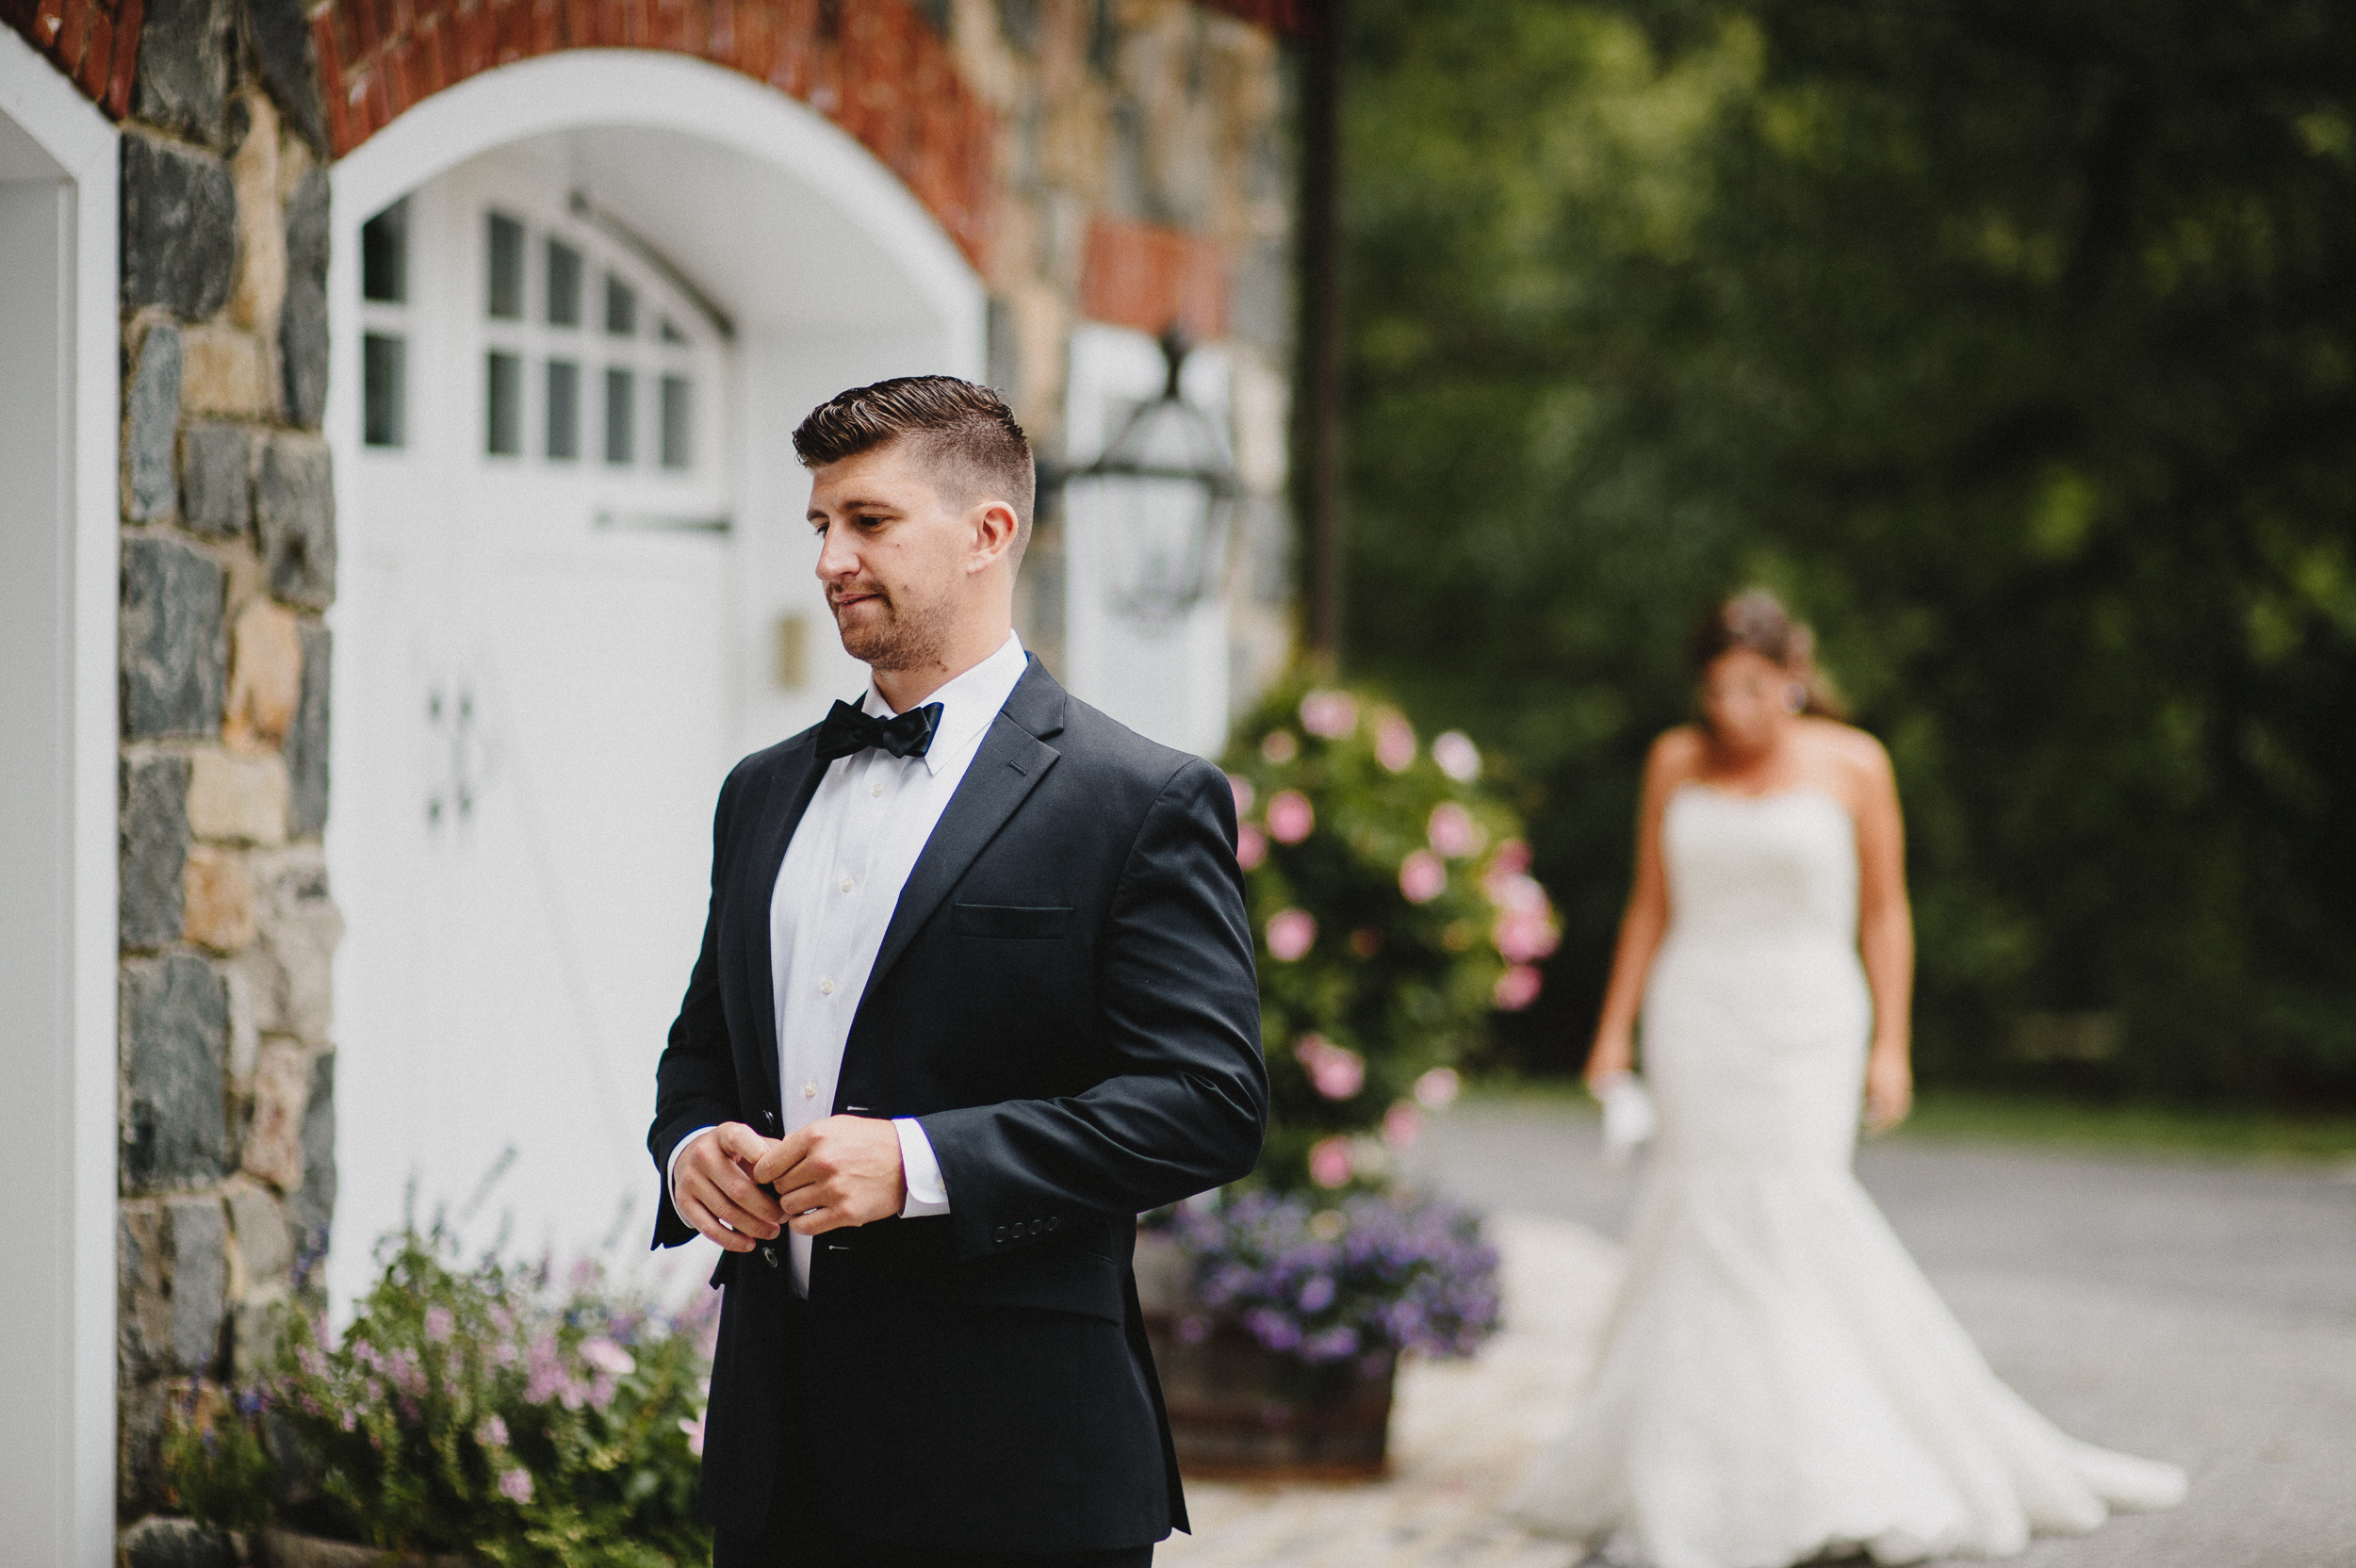 delaware-estate-wedding-photographer-pat-robinson-photography-35.jpg